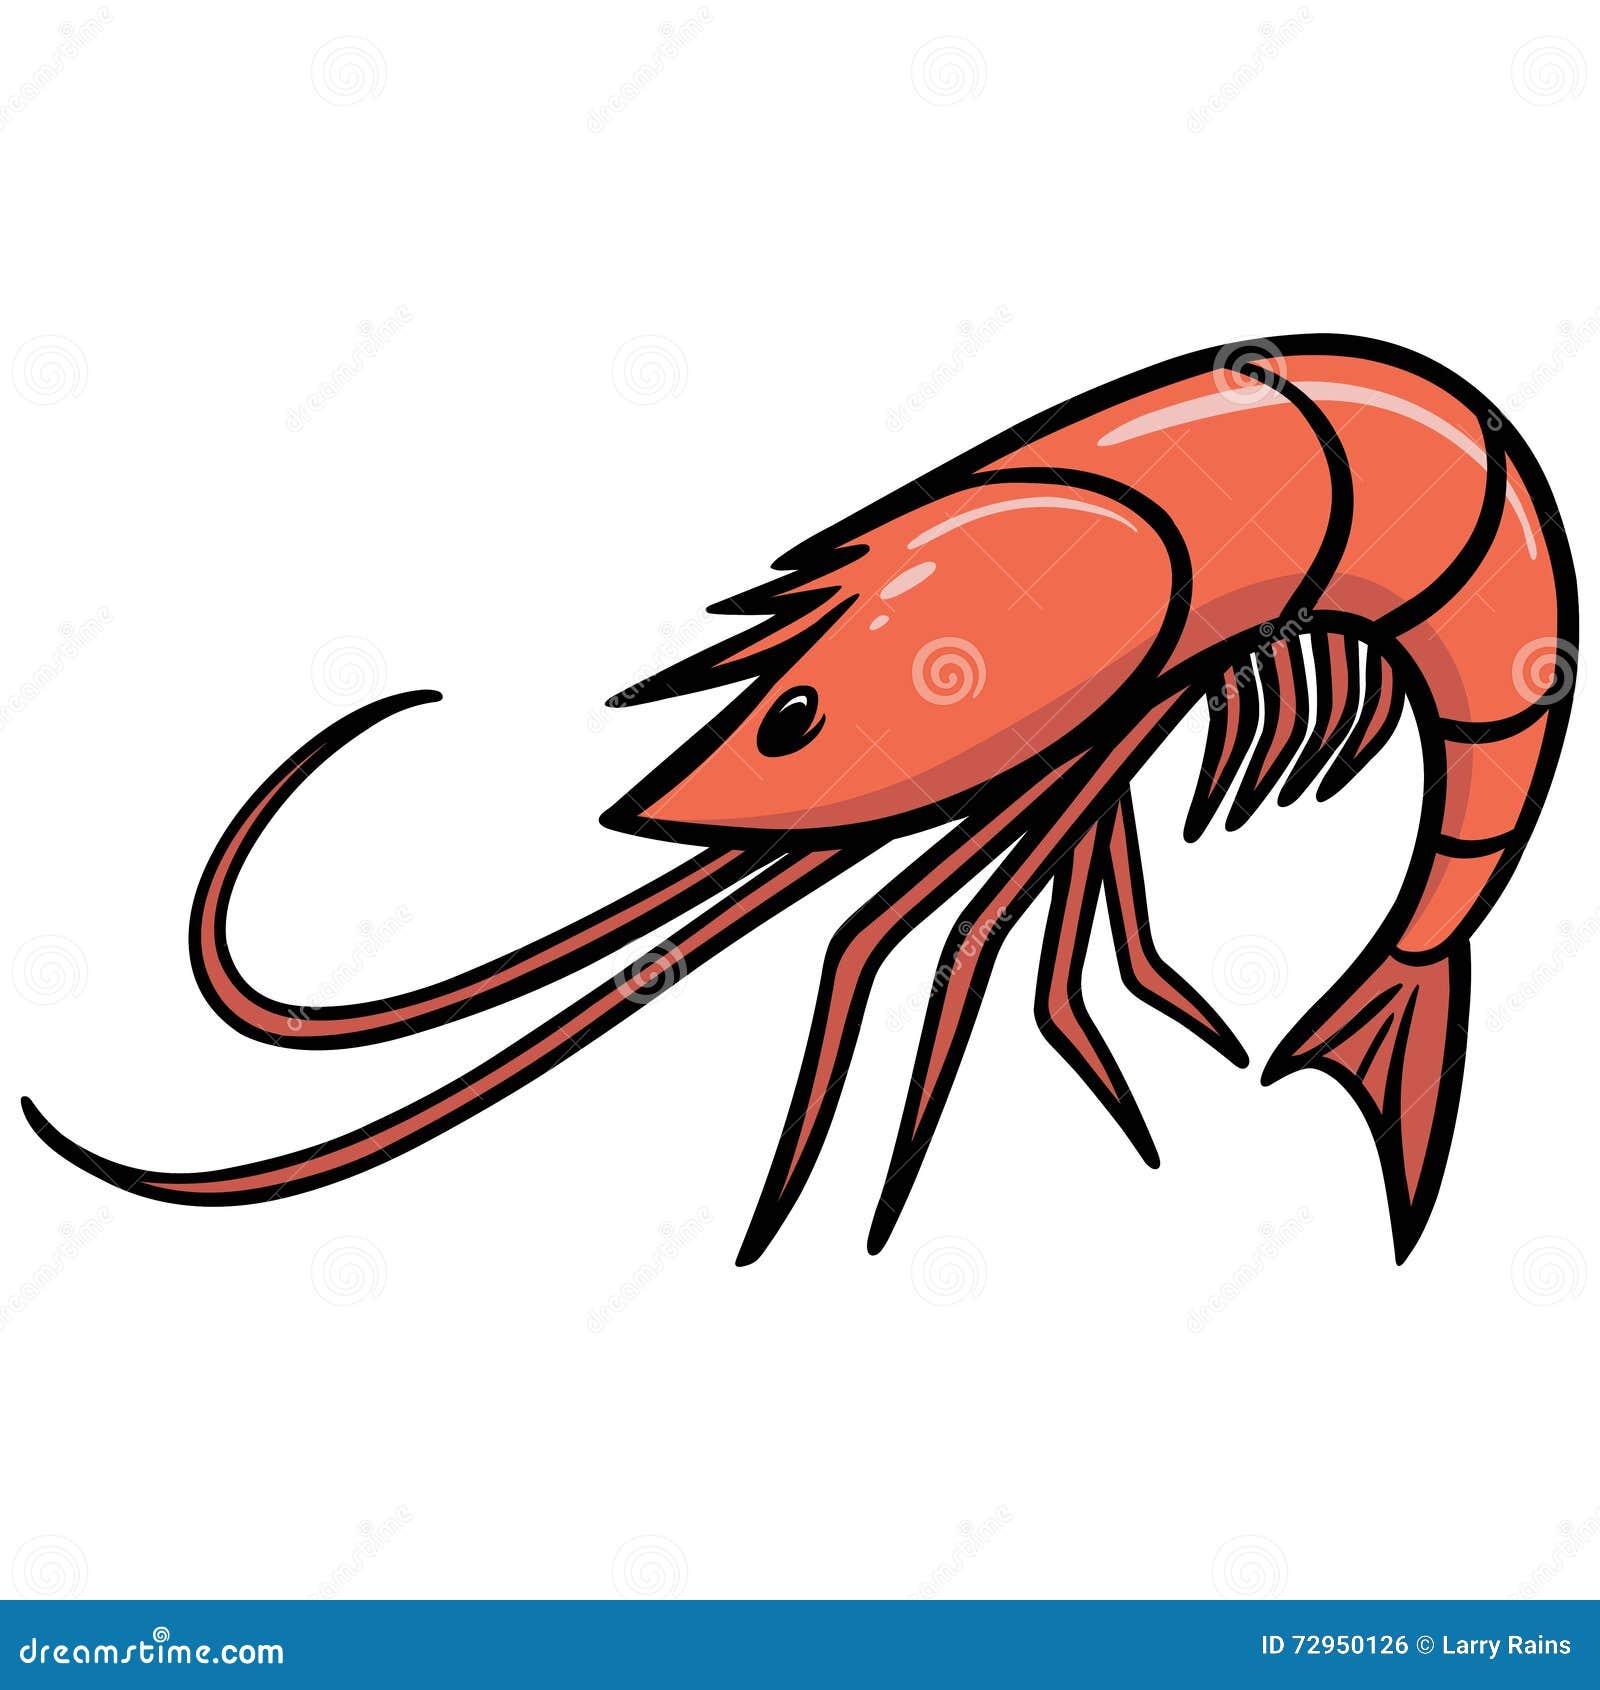 shrimp icon stock vector illustration of stem painting 72950126 rh dreamstime com free clip art pancakes free clip art praying on knees